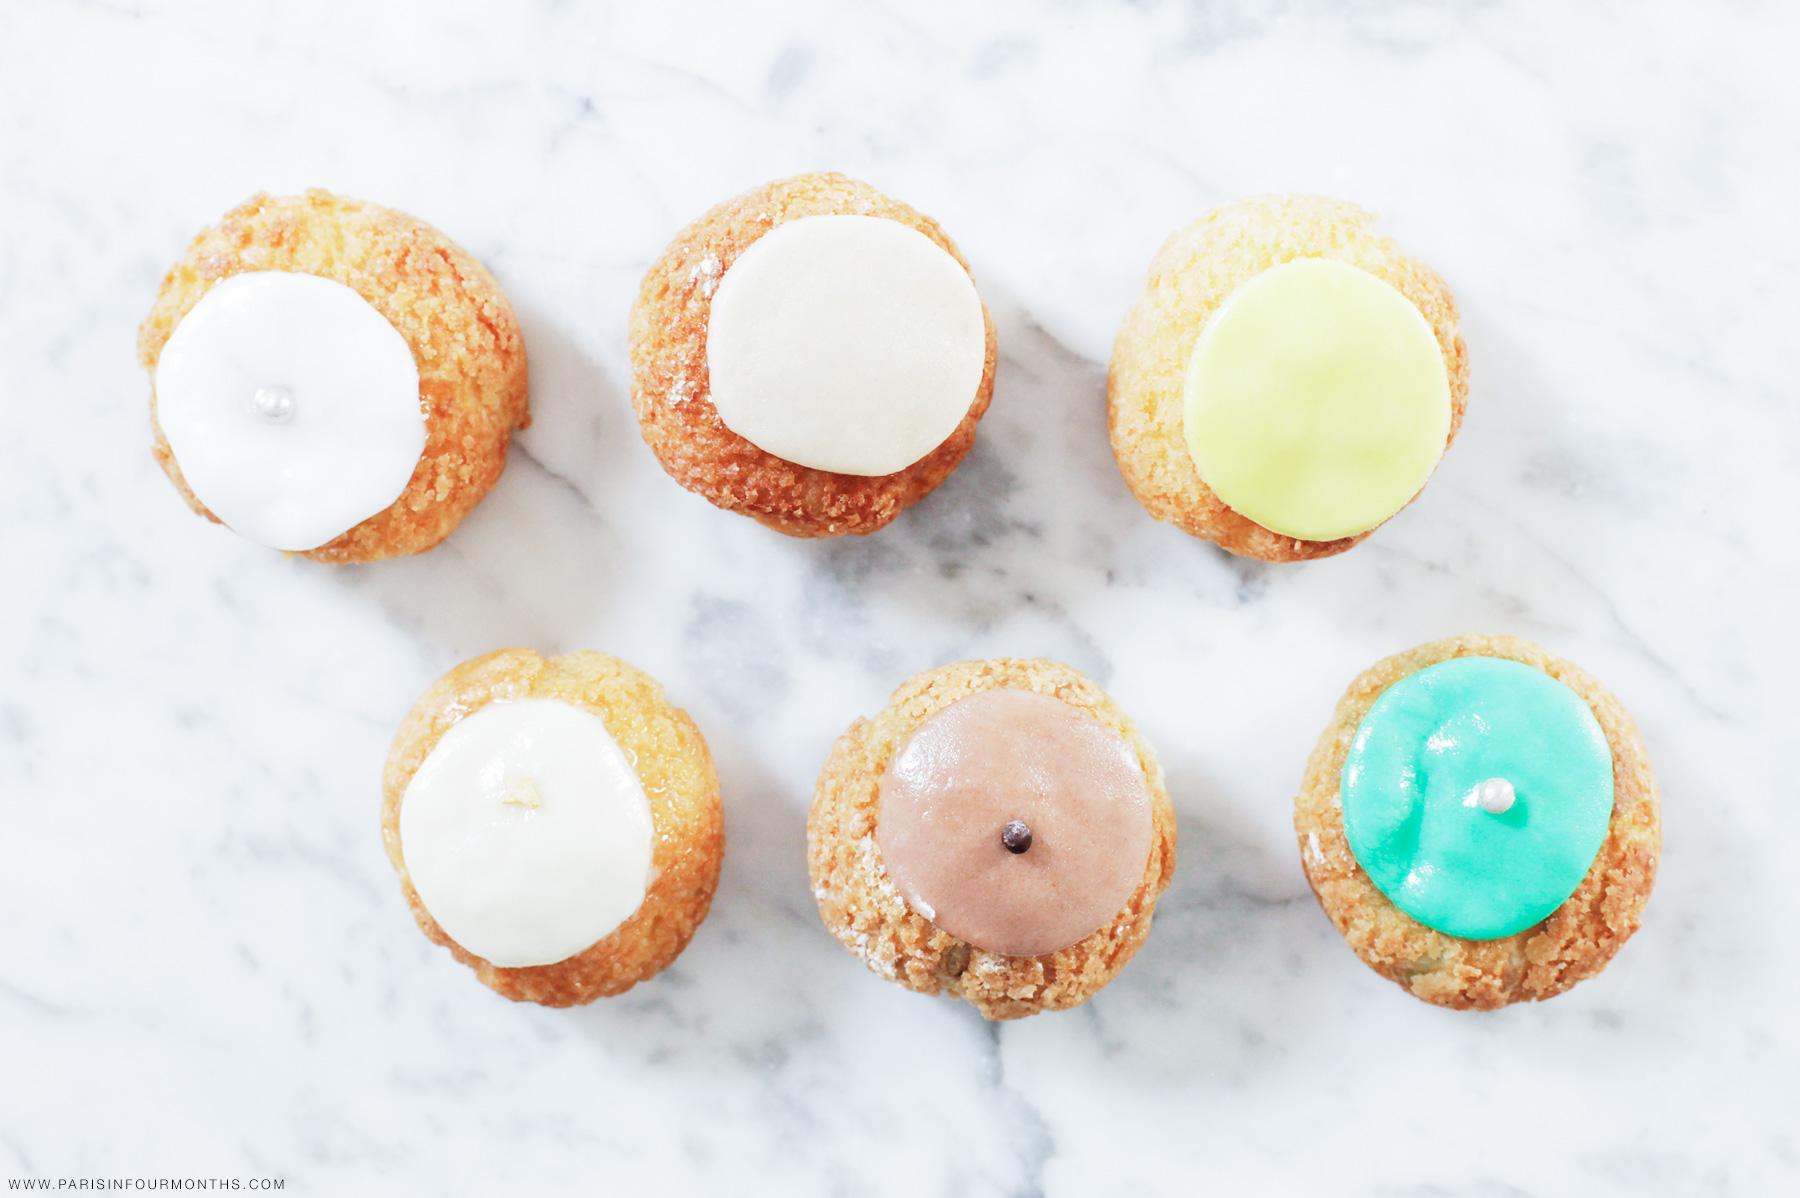 Cream puffs by Carin Olsson (Paris in Four Months)